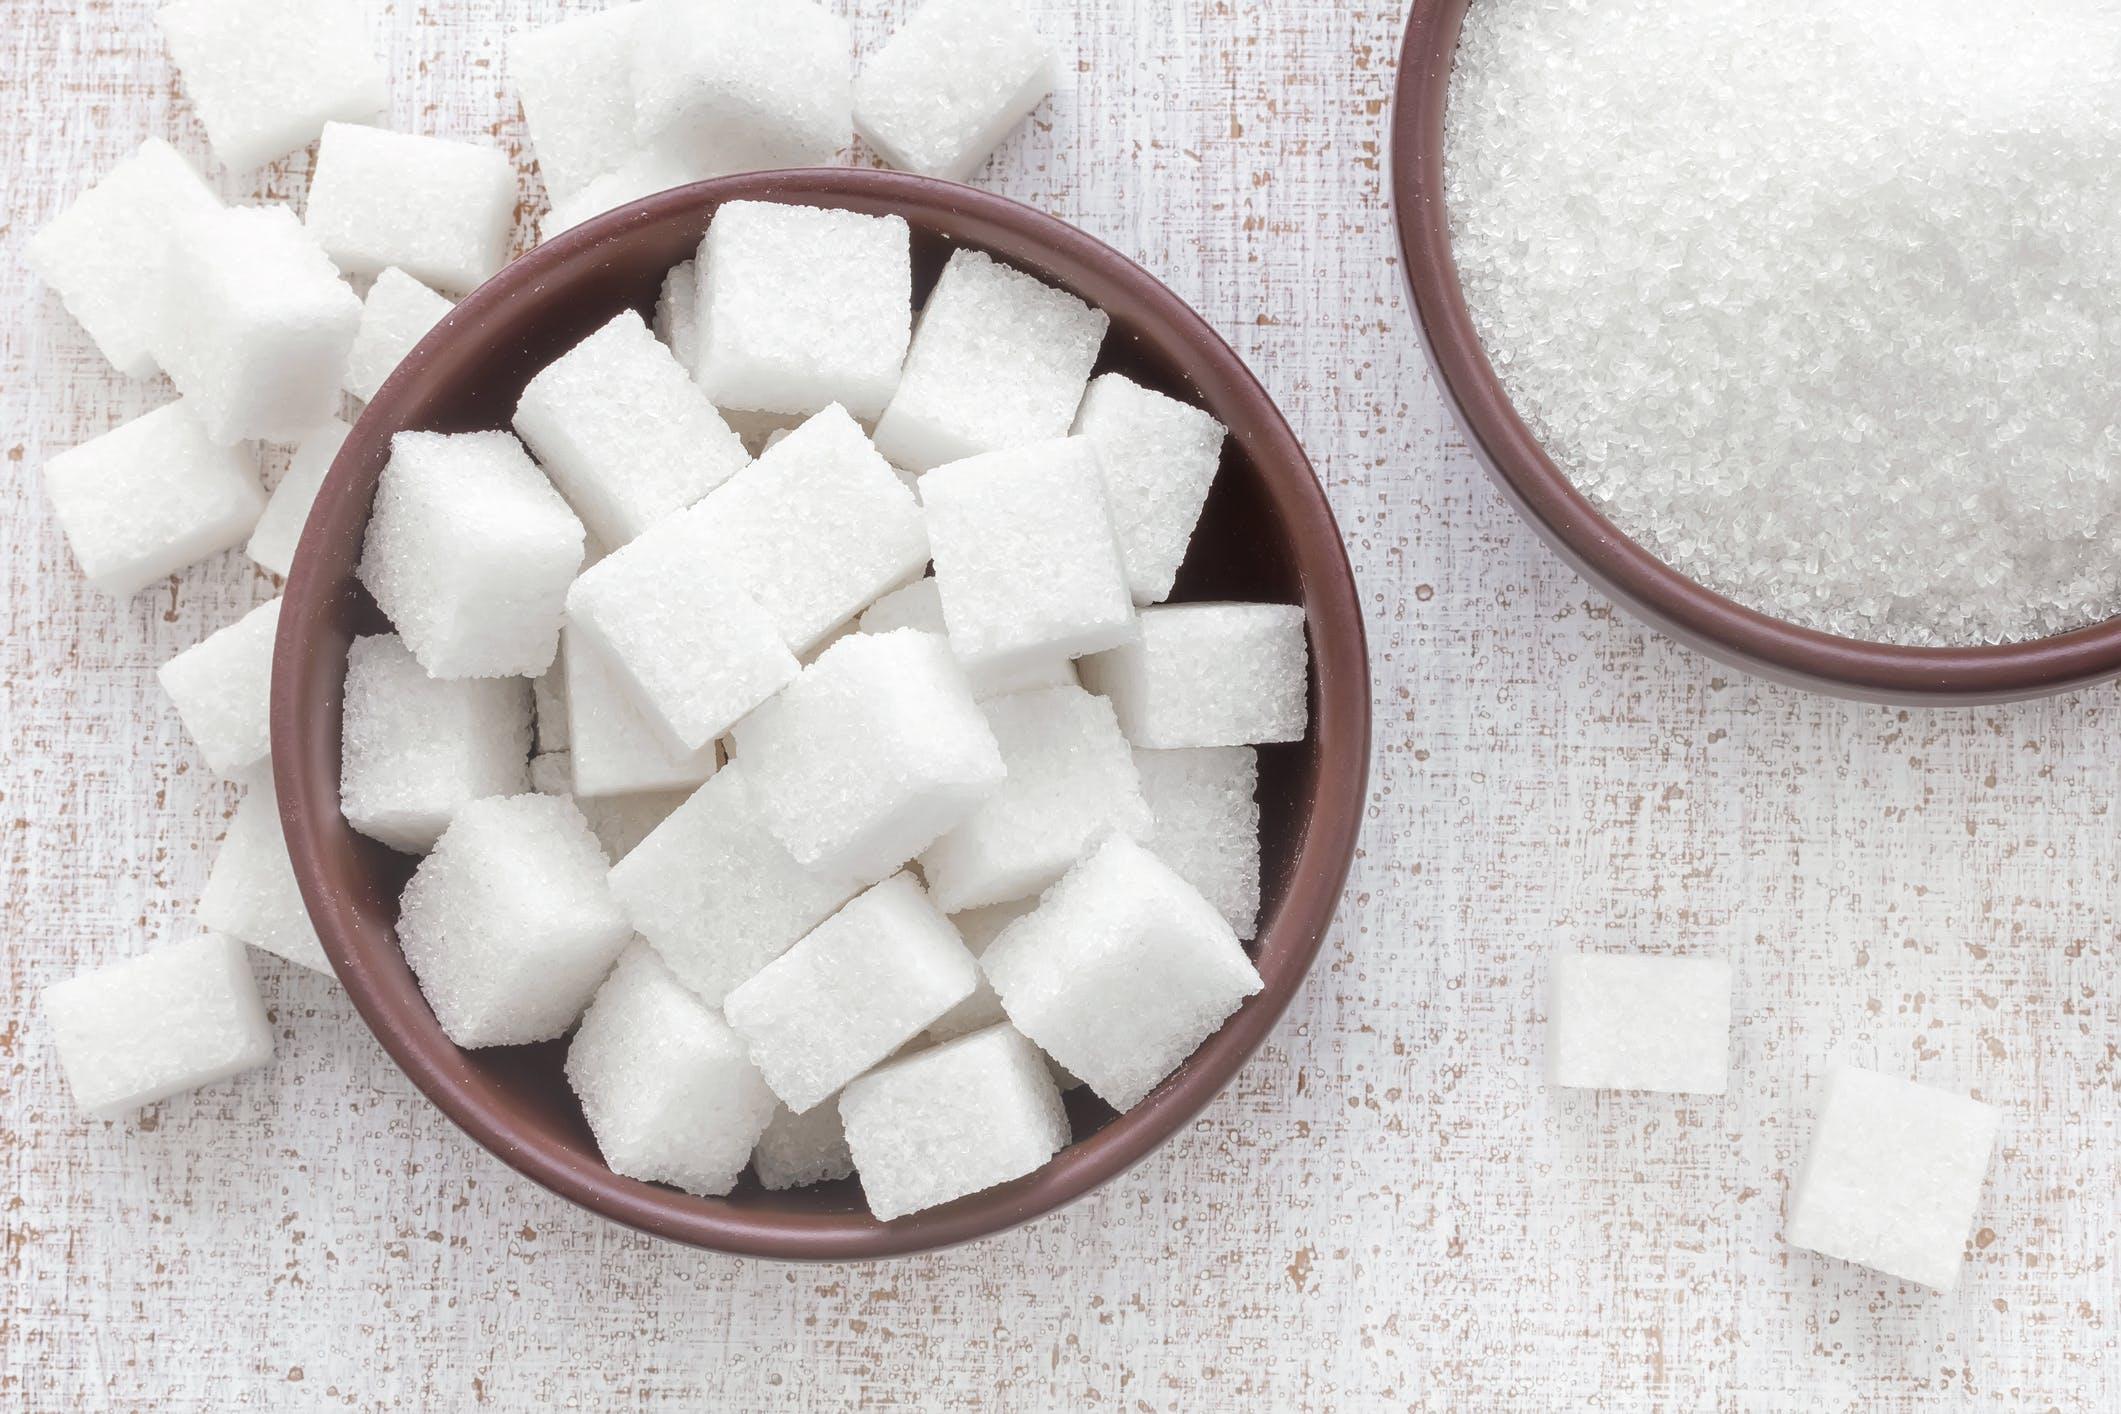 UK hospital campaign: Ditch sugar!